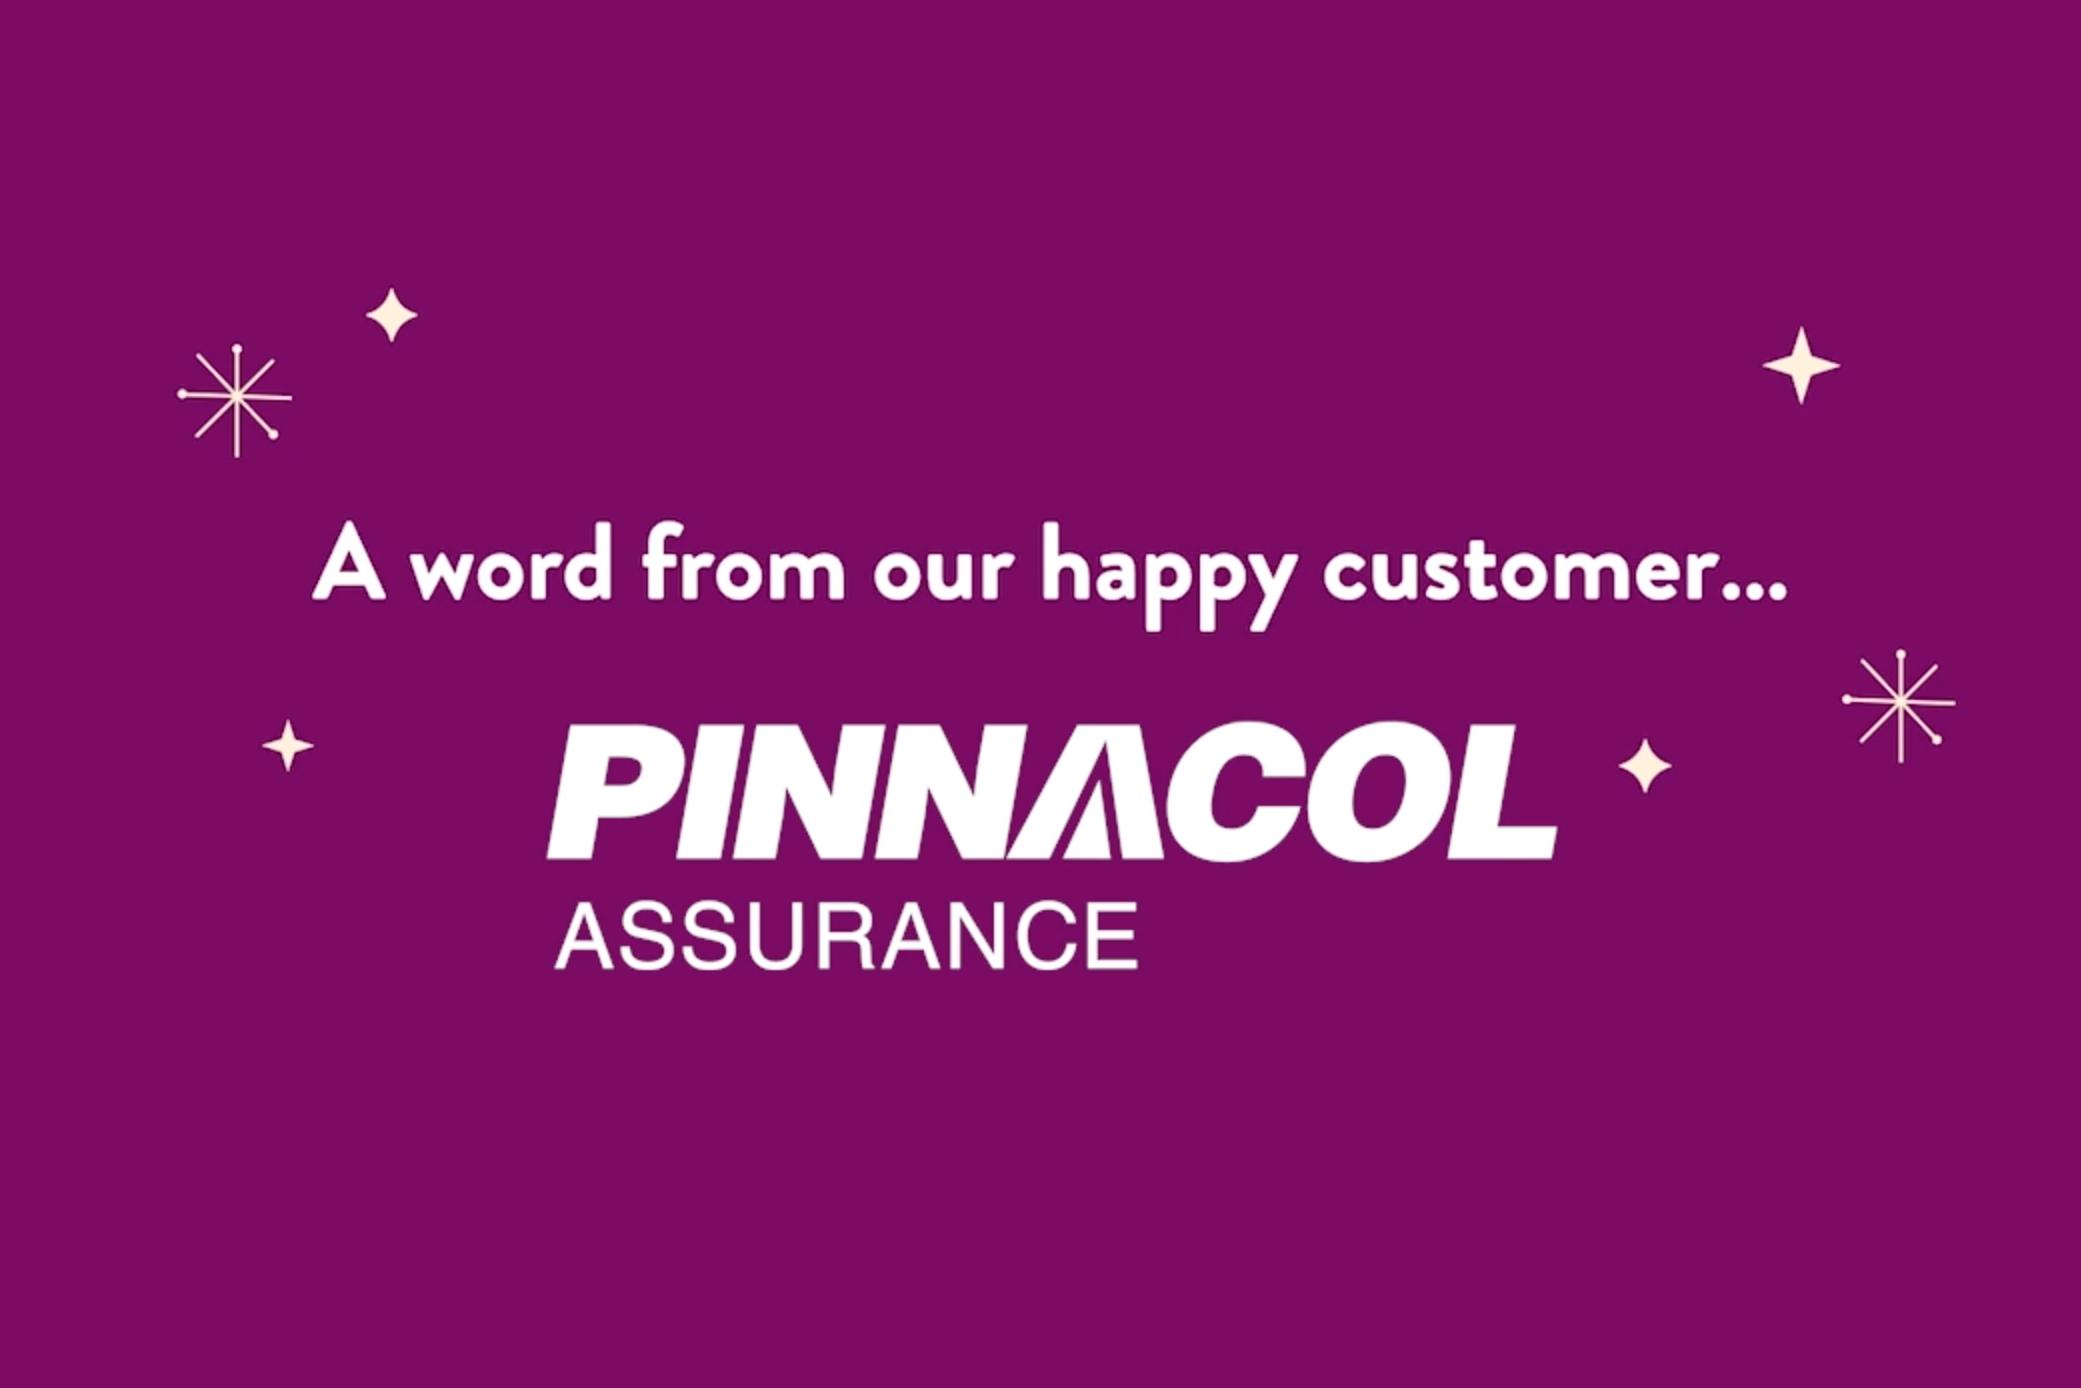 Pinnacol Assurance Case Study